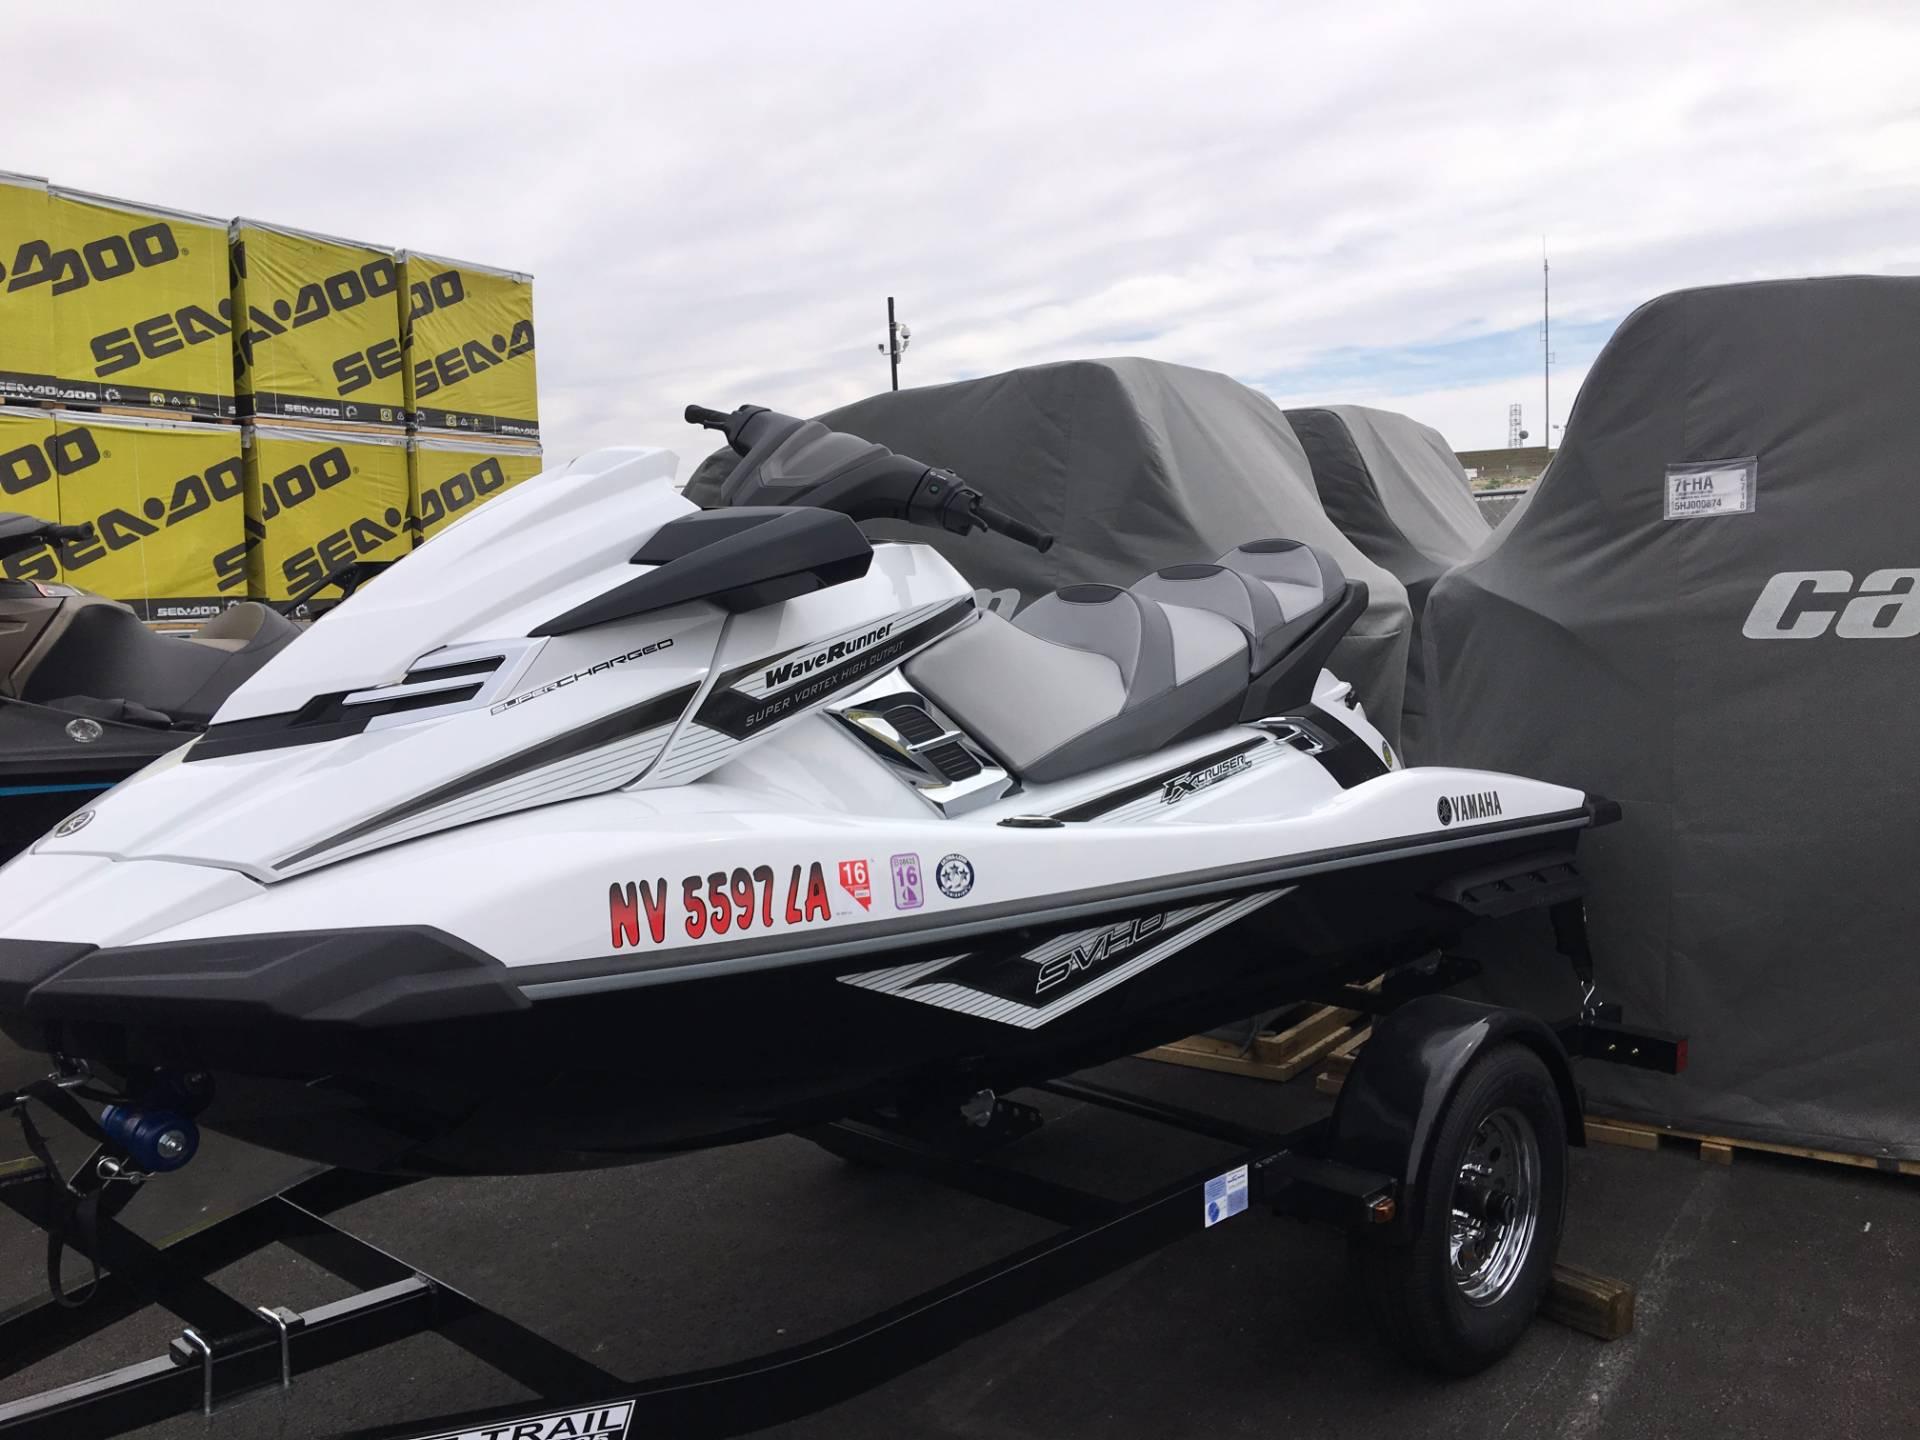 2016 Yamaha FX Cruiser SVHO 2